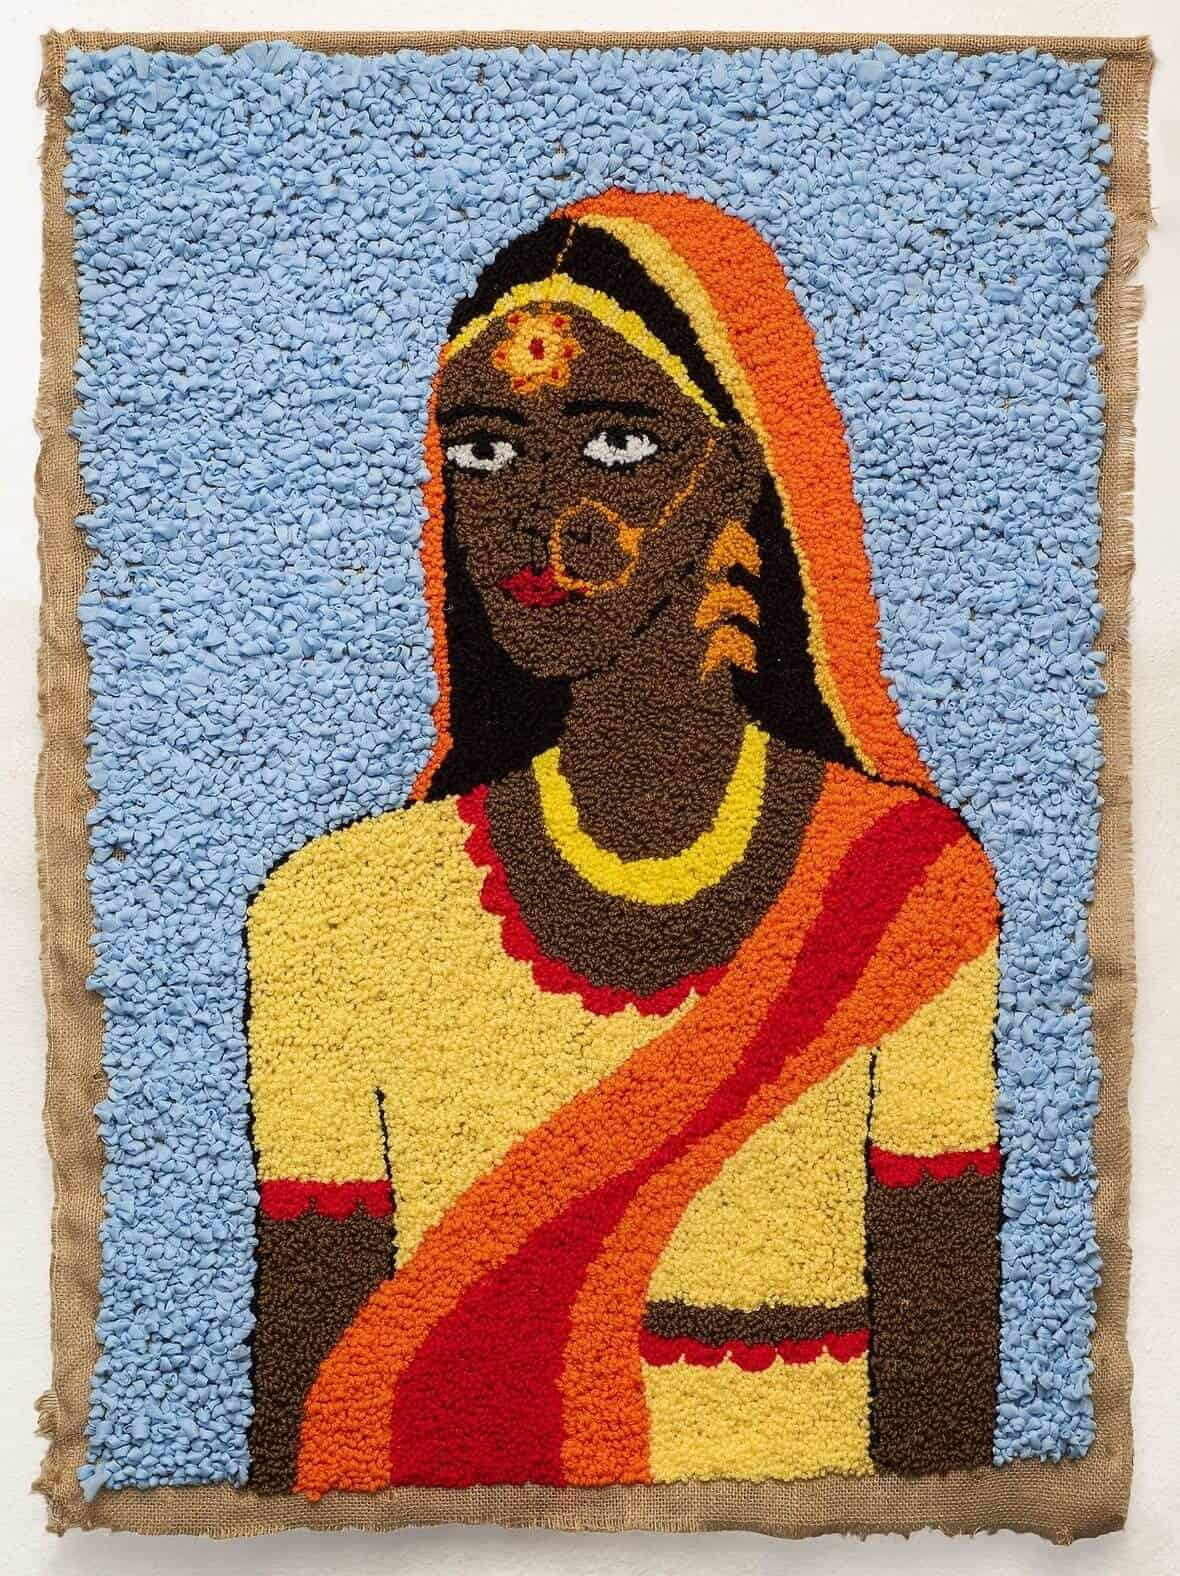 Talia Ramkilawan, Untitled III, 2019. Image courtesy of SMITH & FNB Art Joburg.